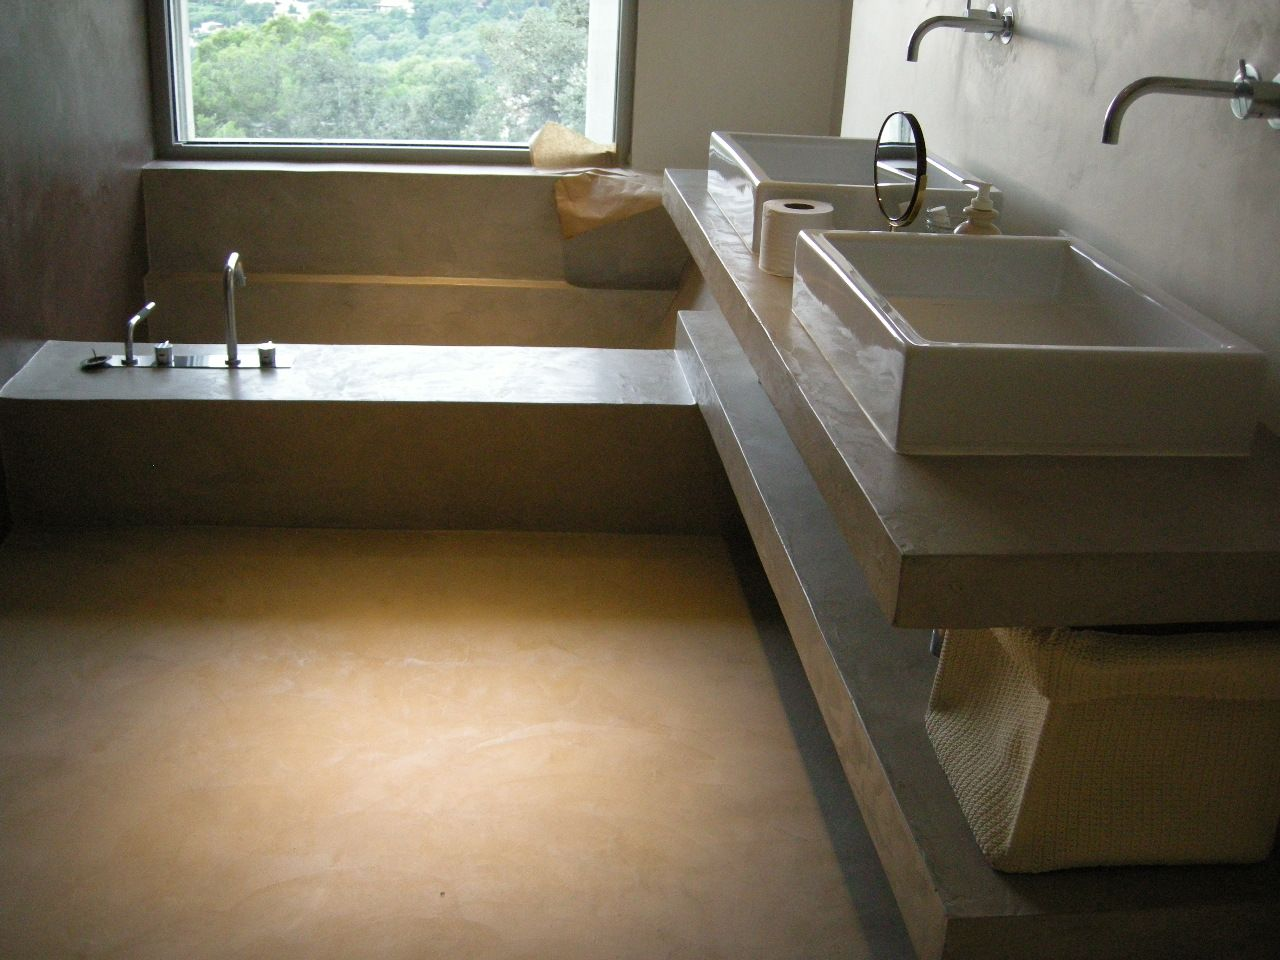 Ba o de cemento pulido habitaciones ba os - Resina in cucina al posto delle piastrelle ...